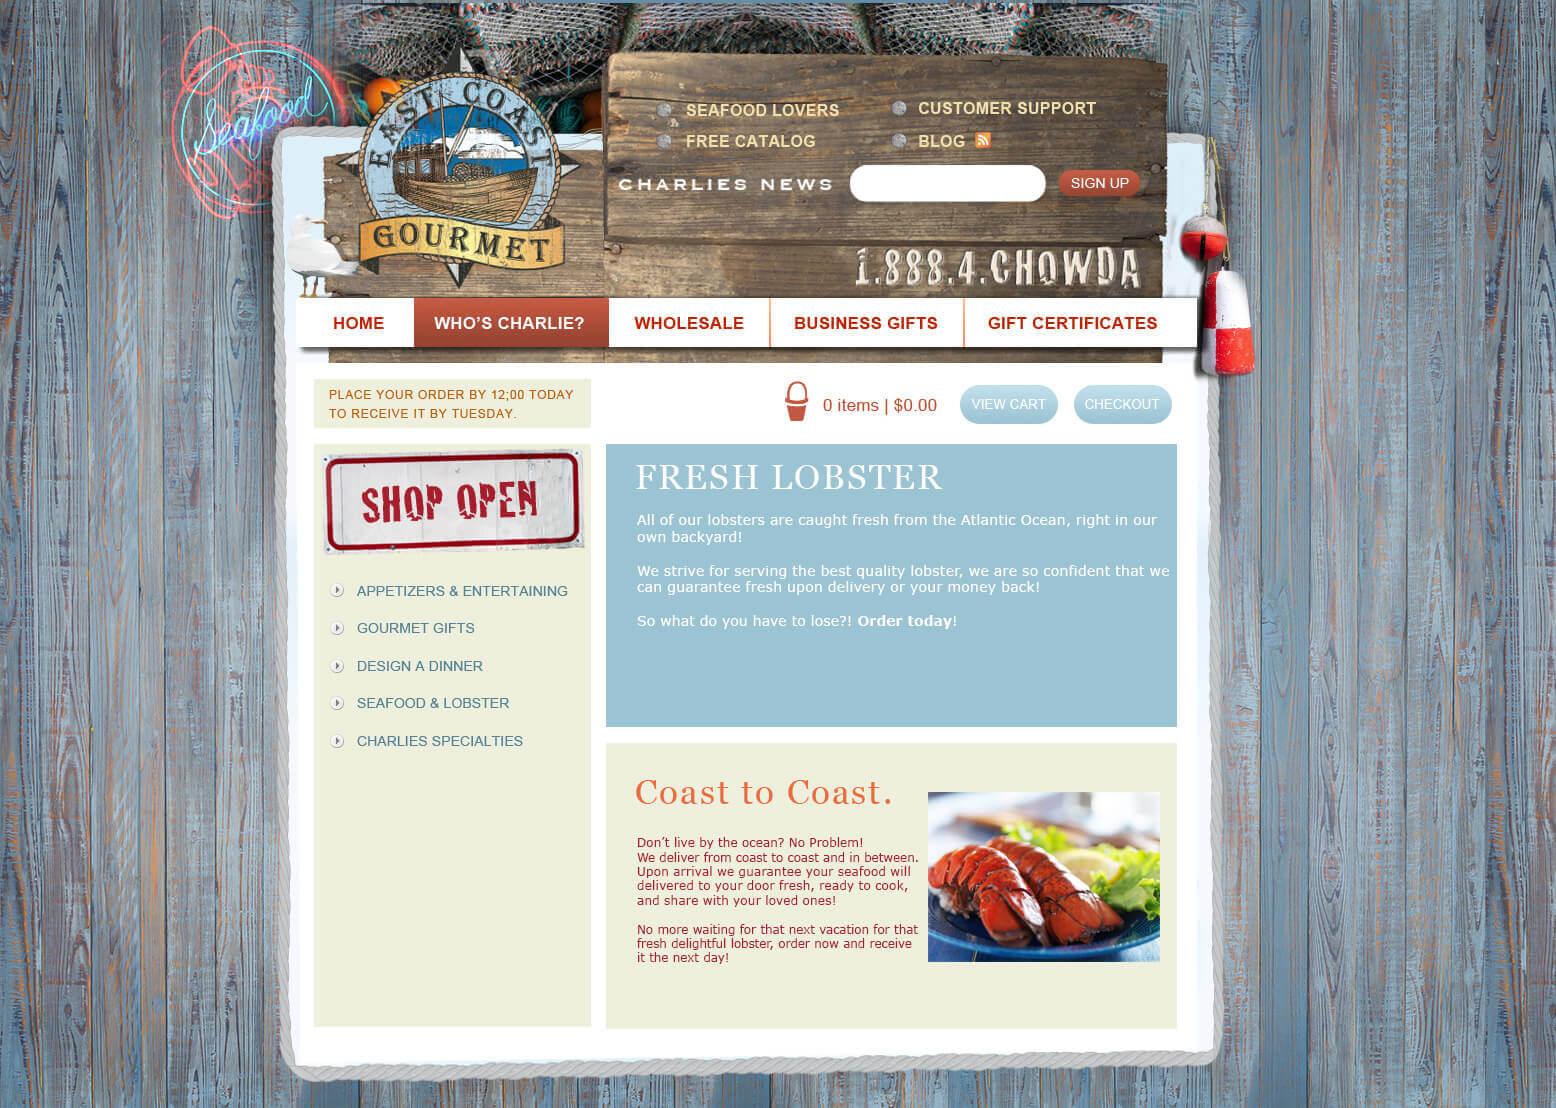 Gourmet Website Design 2 Gourmet Website Design